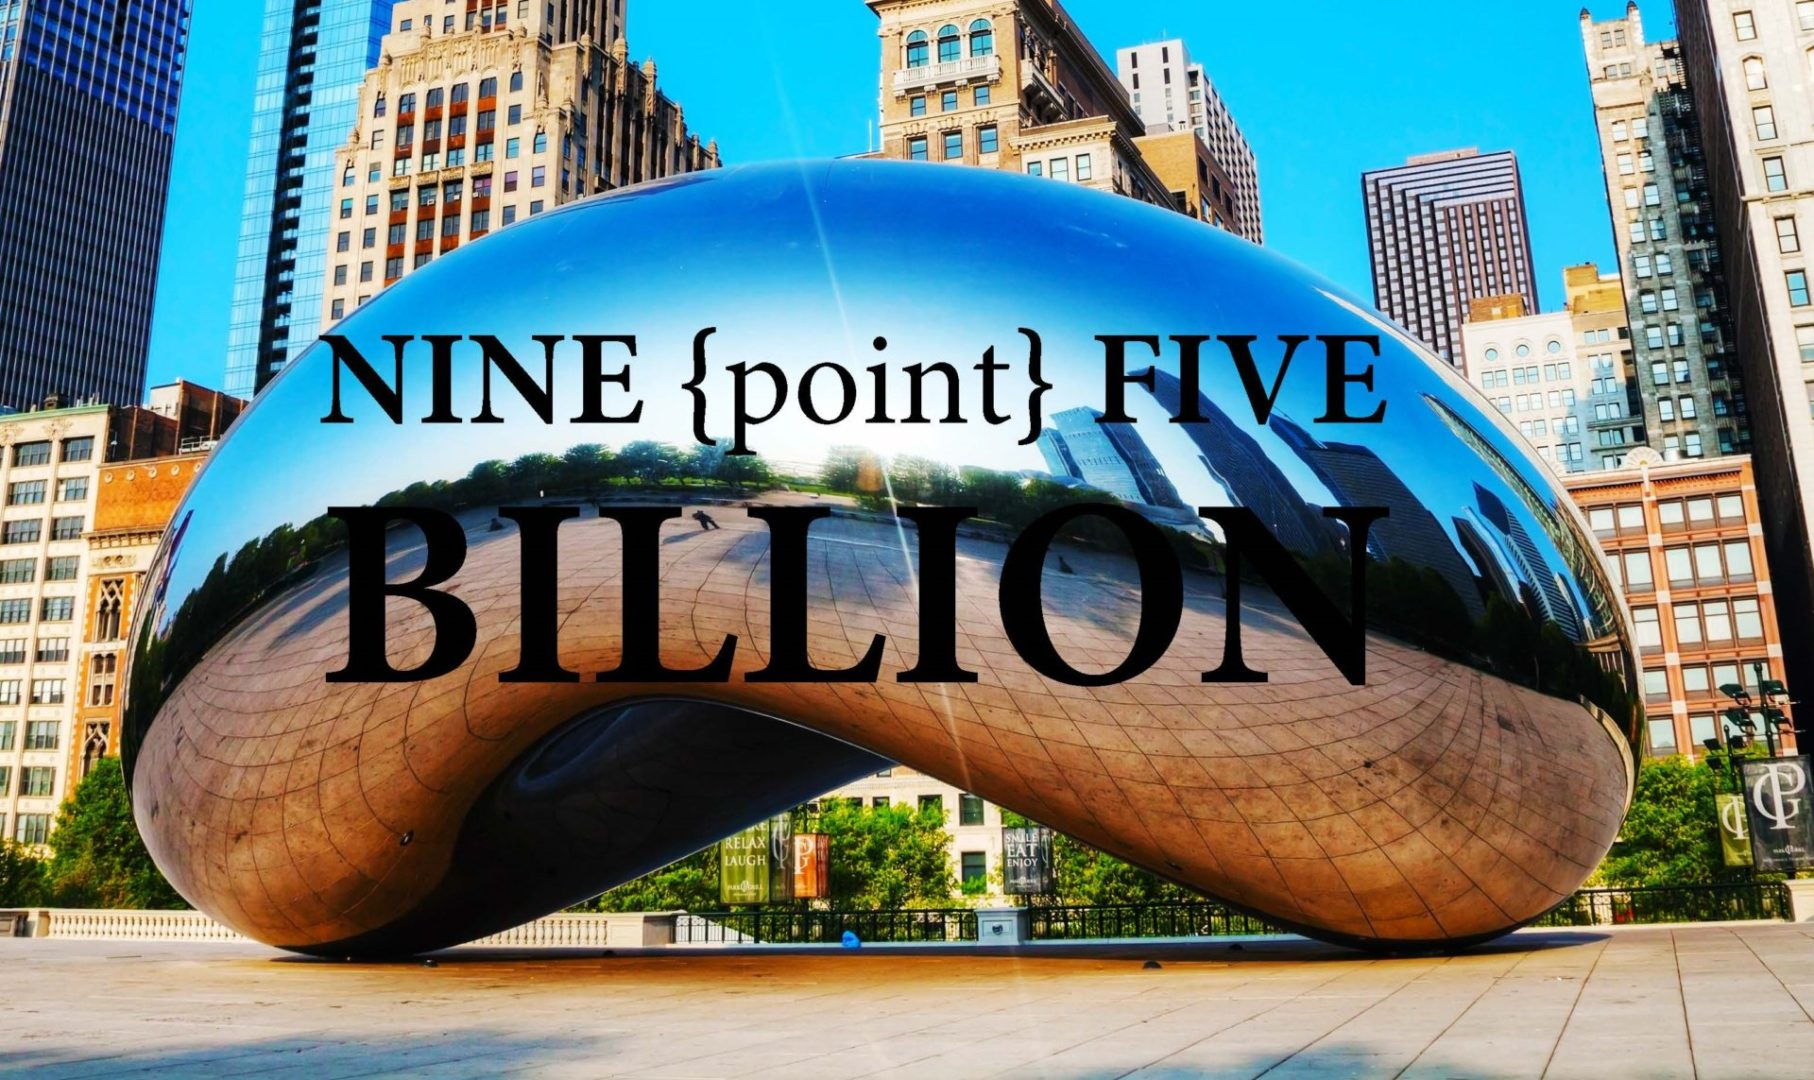 9.5 billion